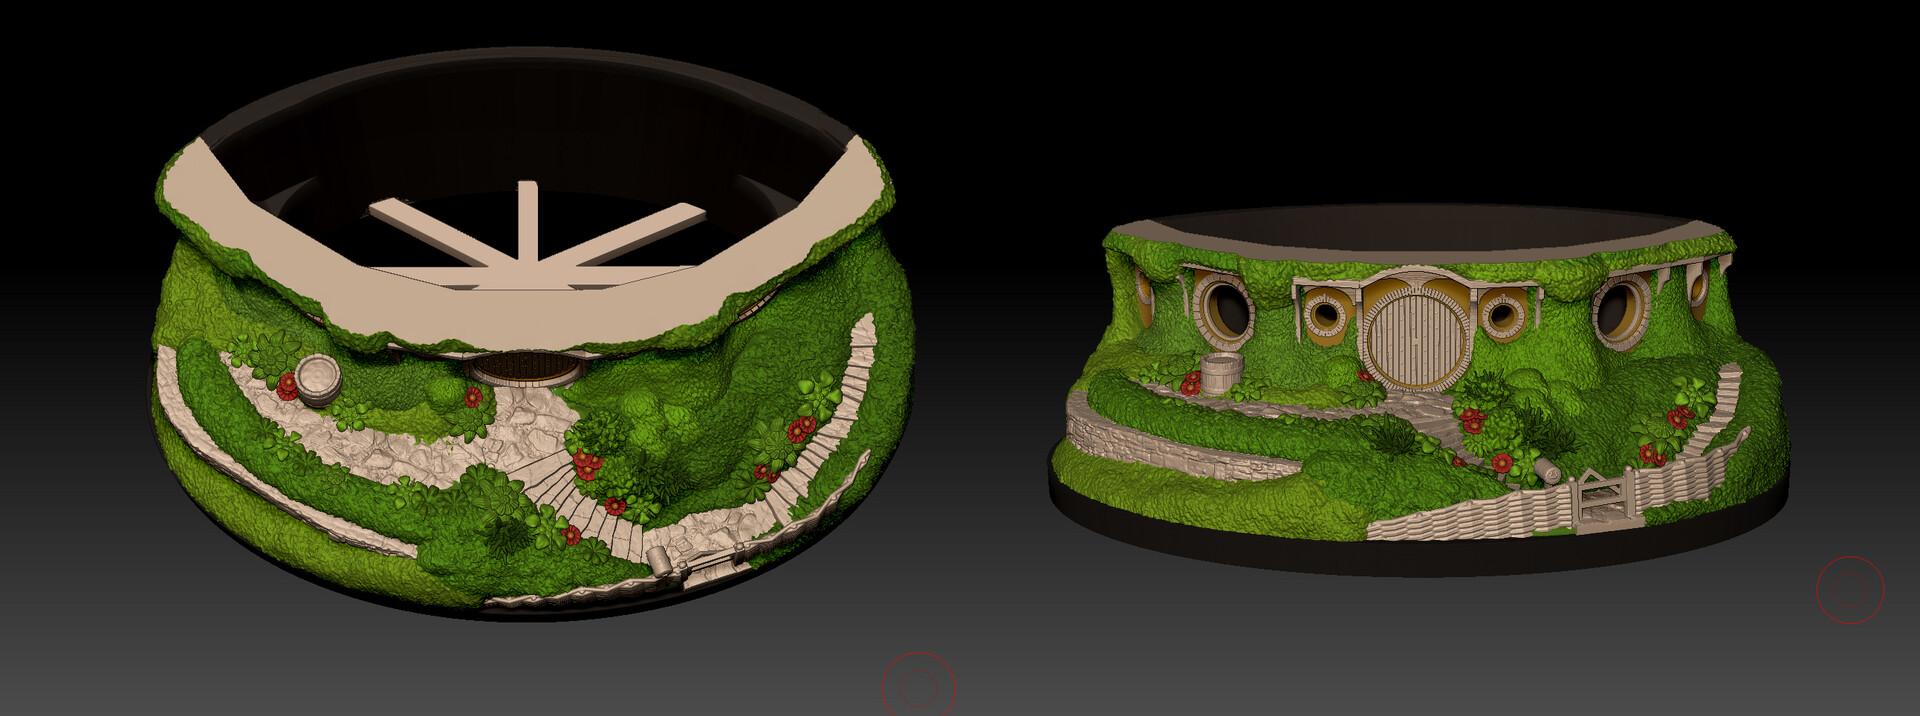 Artstation Bag End Hobbiton Bonsai Pot For 3d Printing Tomas Dotzauer